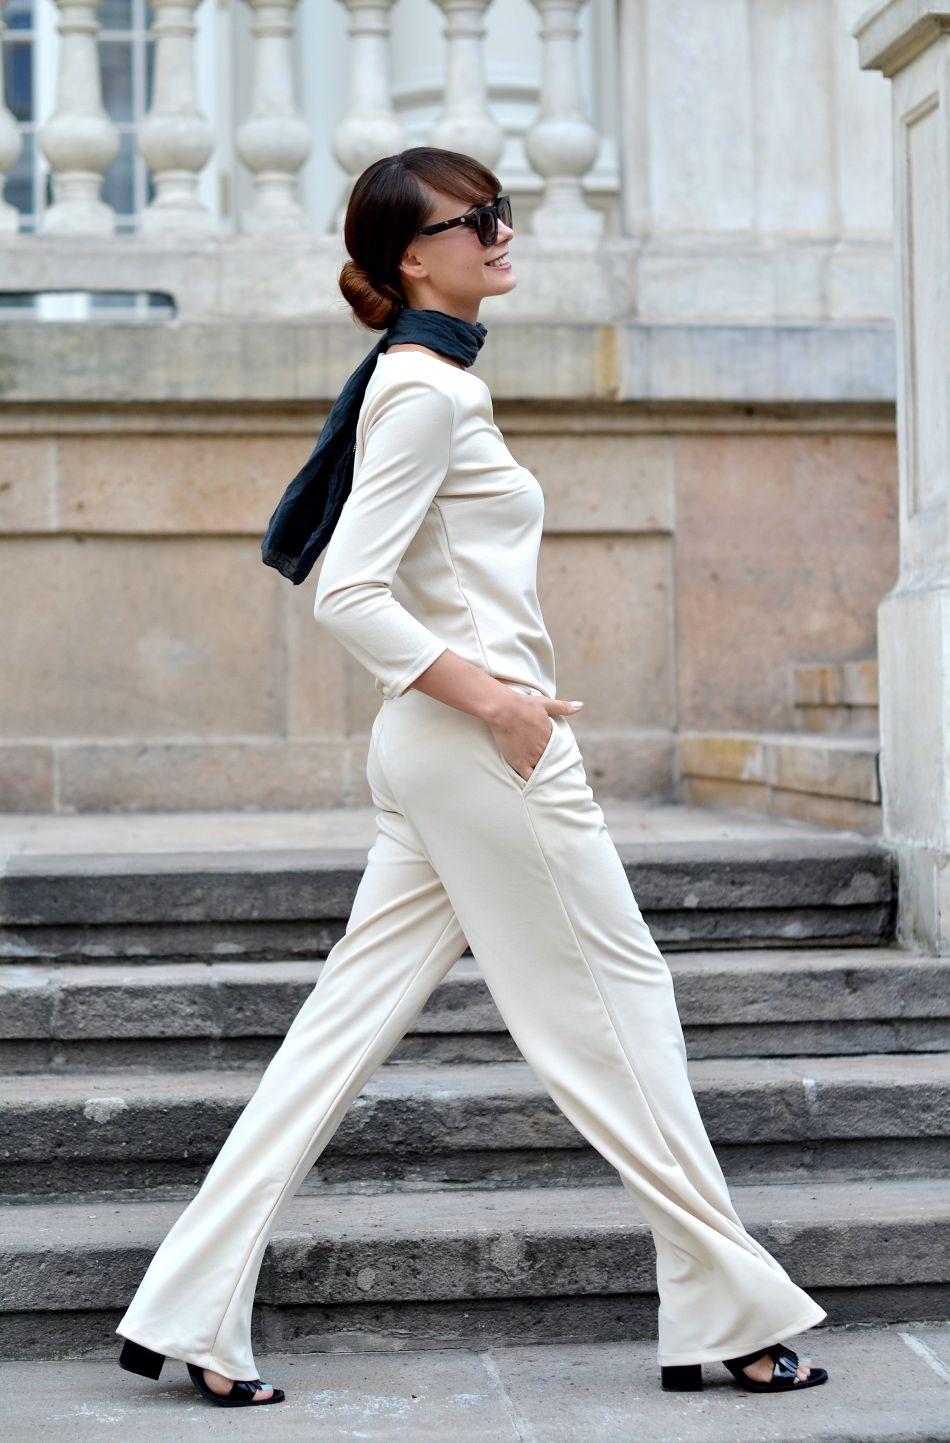 blog roku 2014 | blog moda | uroda | techniki motywacyjne